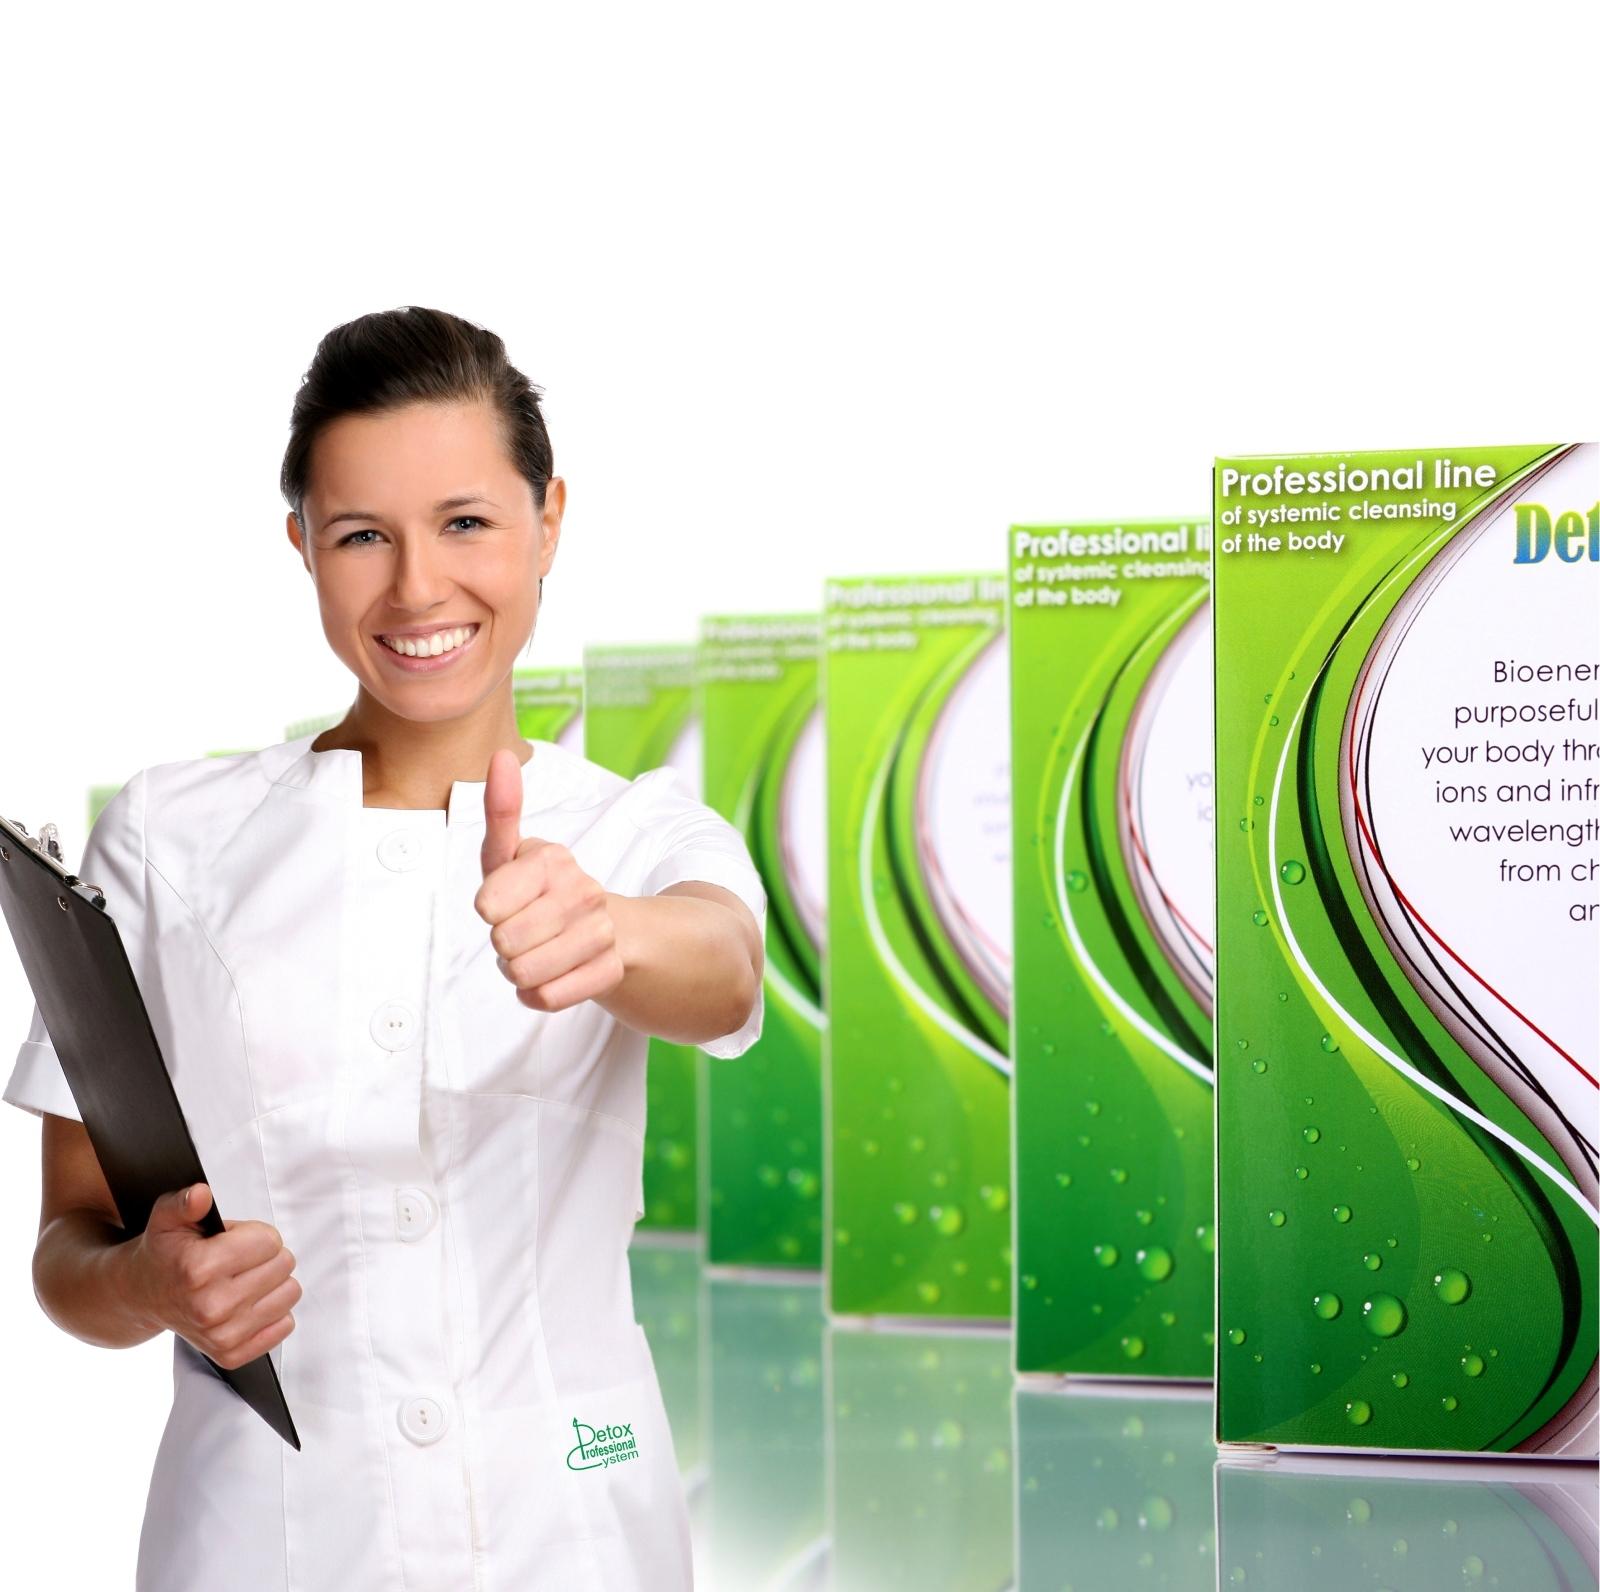 Detox professional system